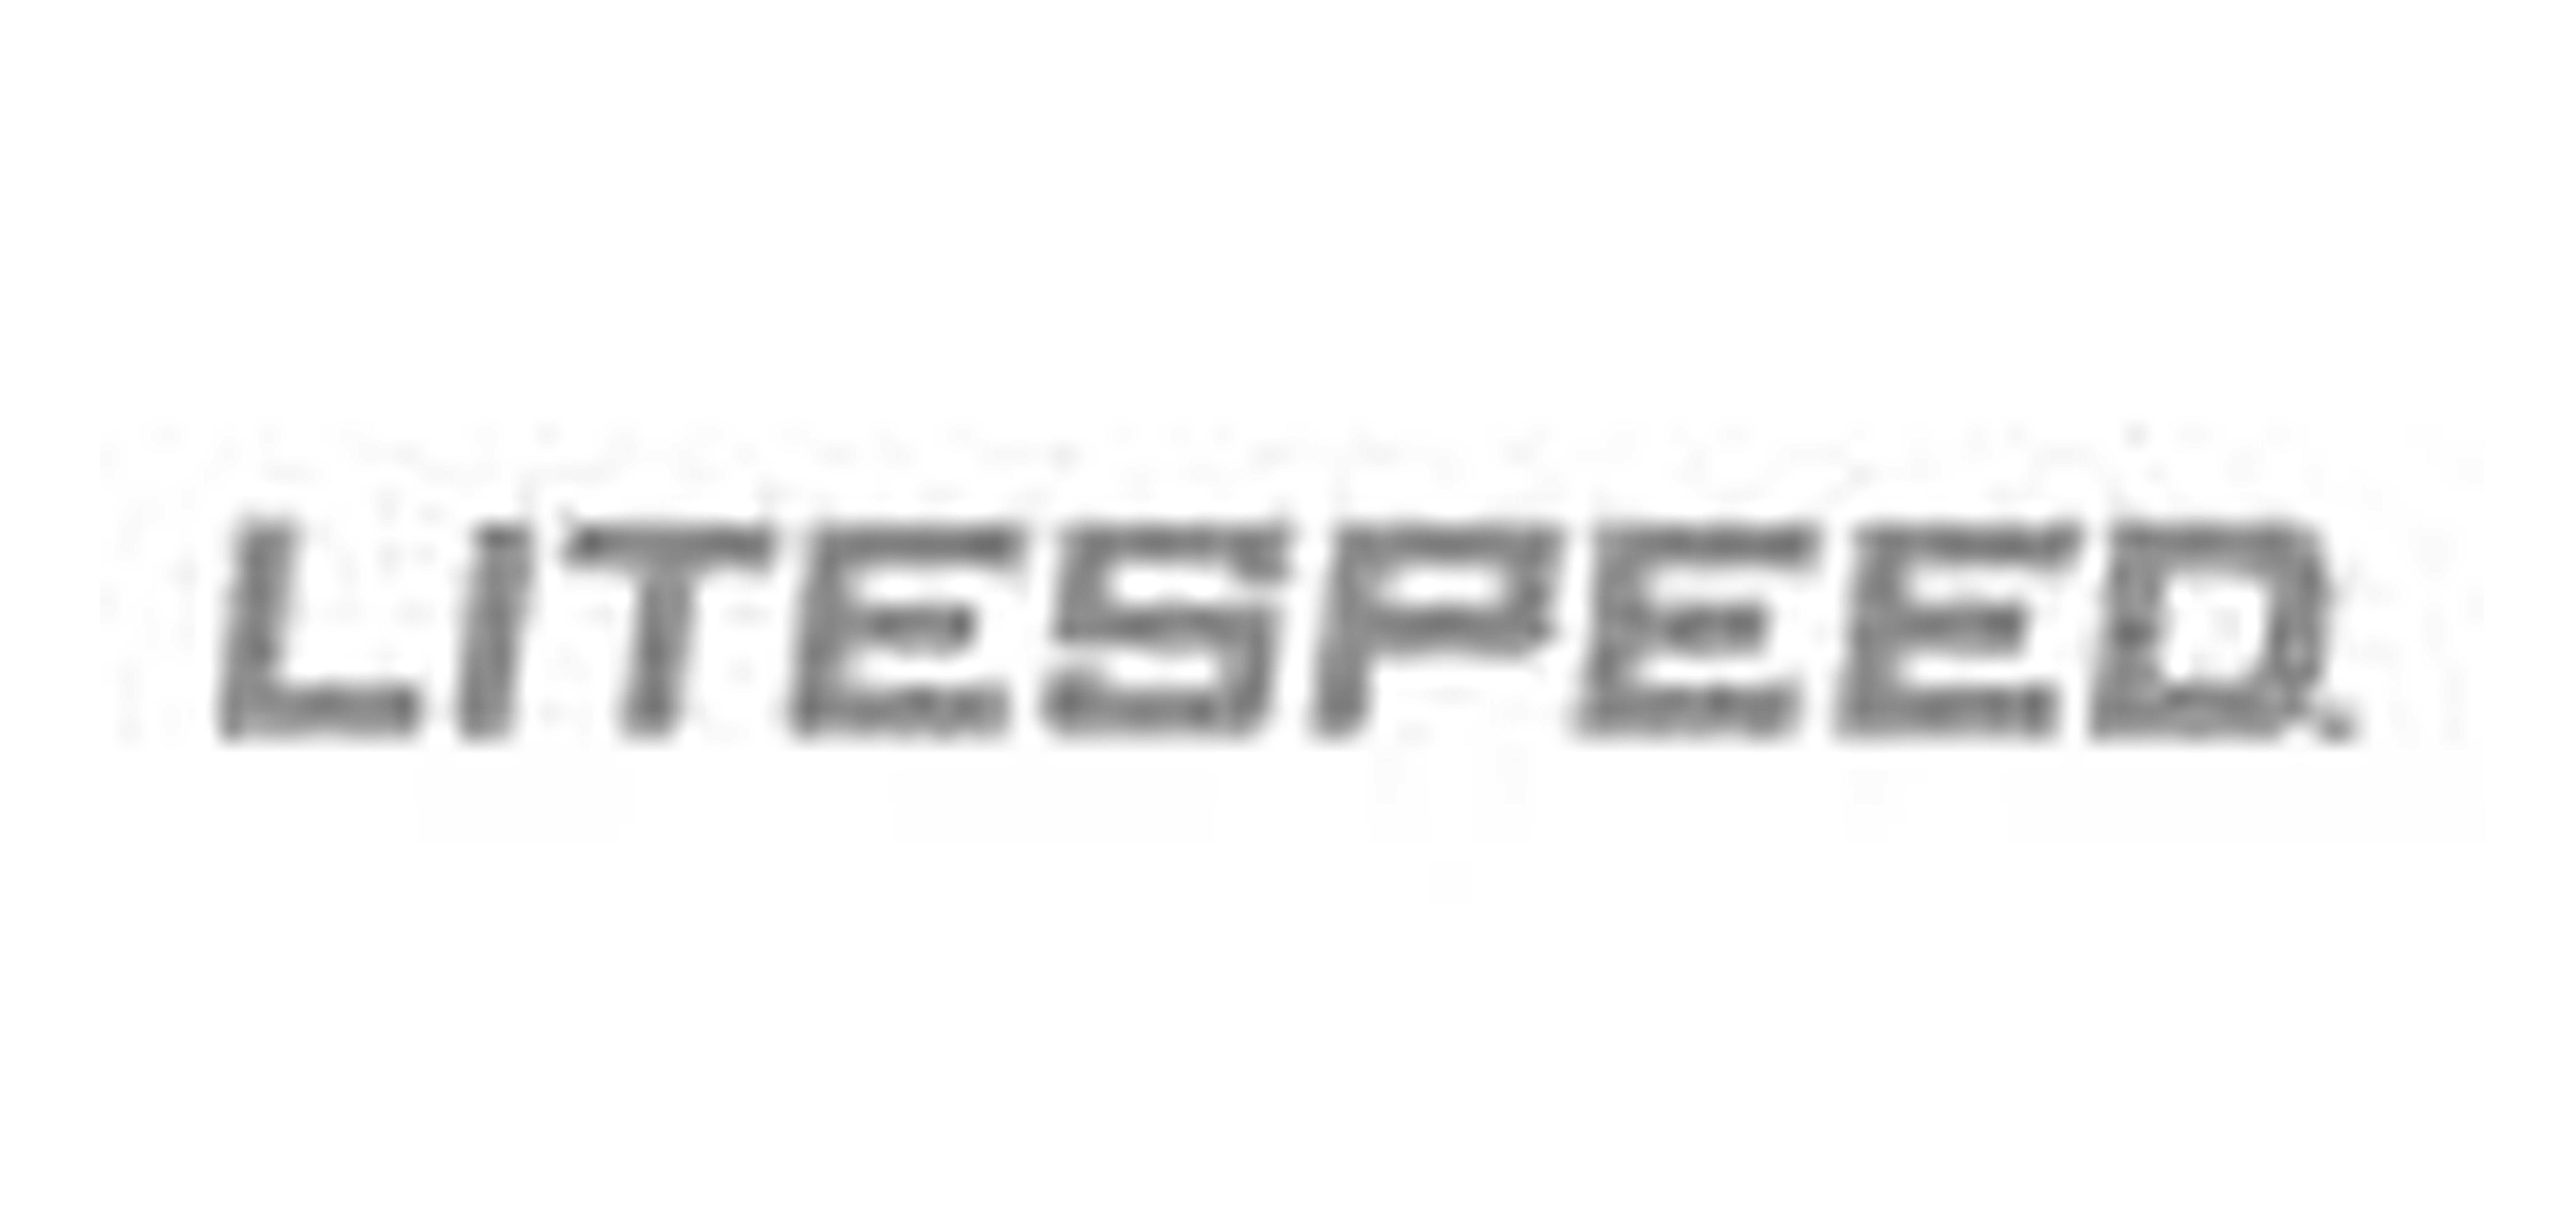 litespeed是什么牌子_litespeed品牌怎么样?